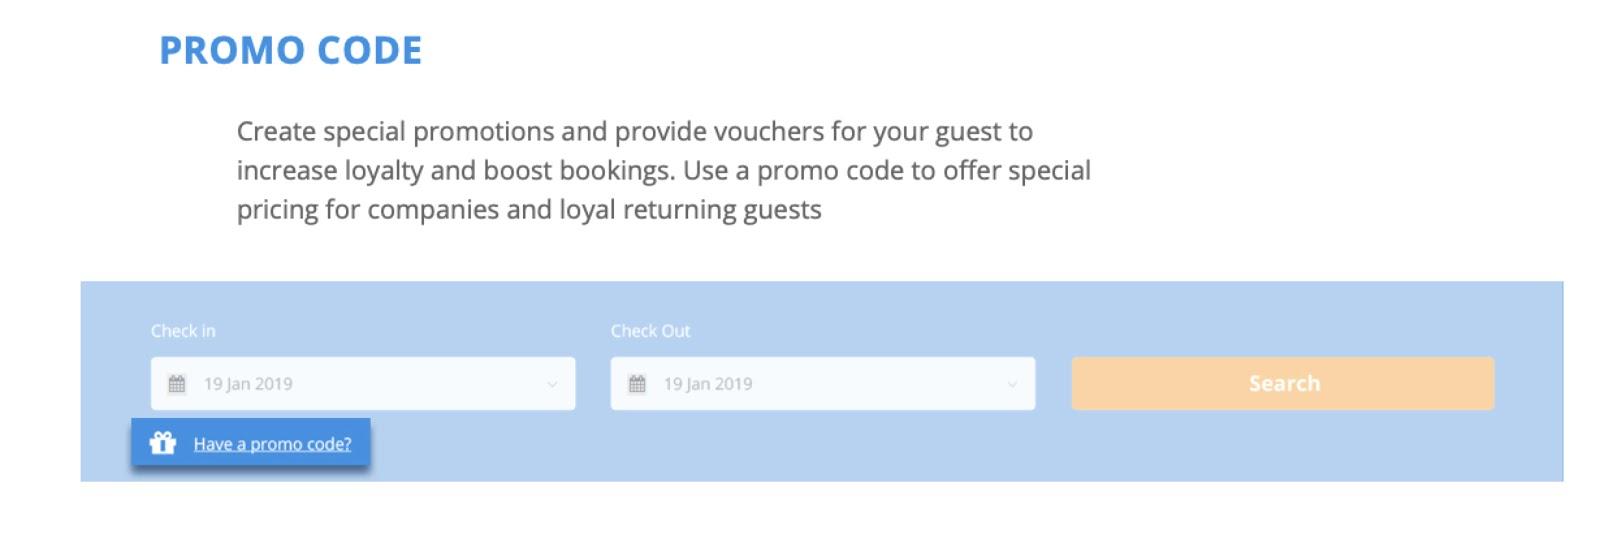 promo code - voucher - cultbooking